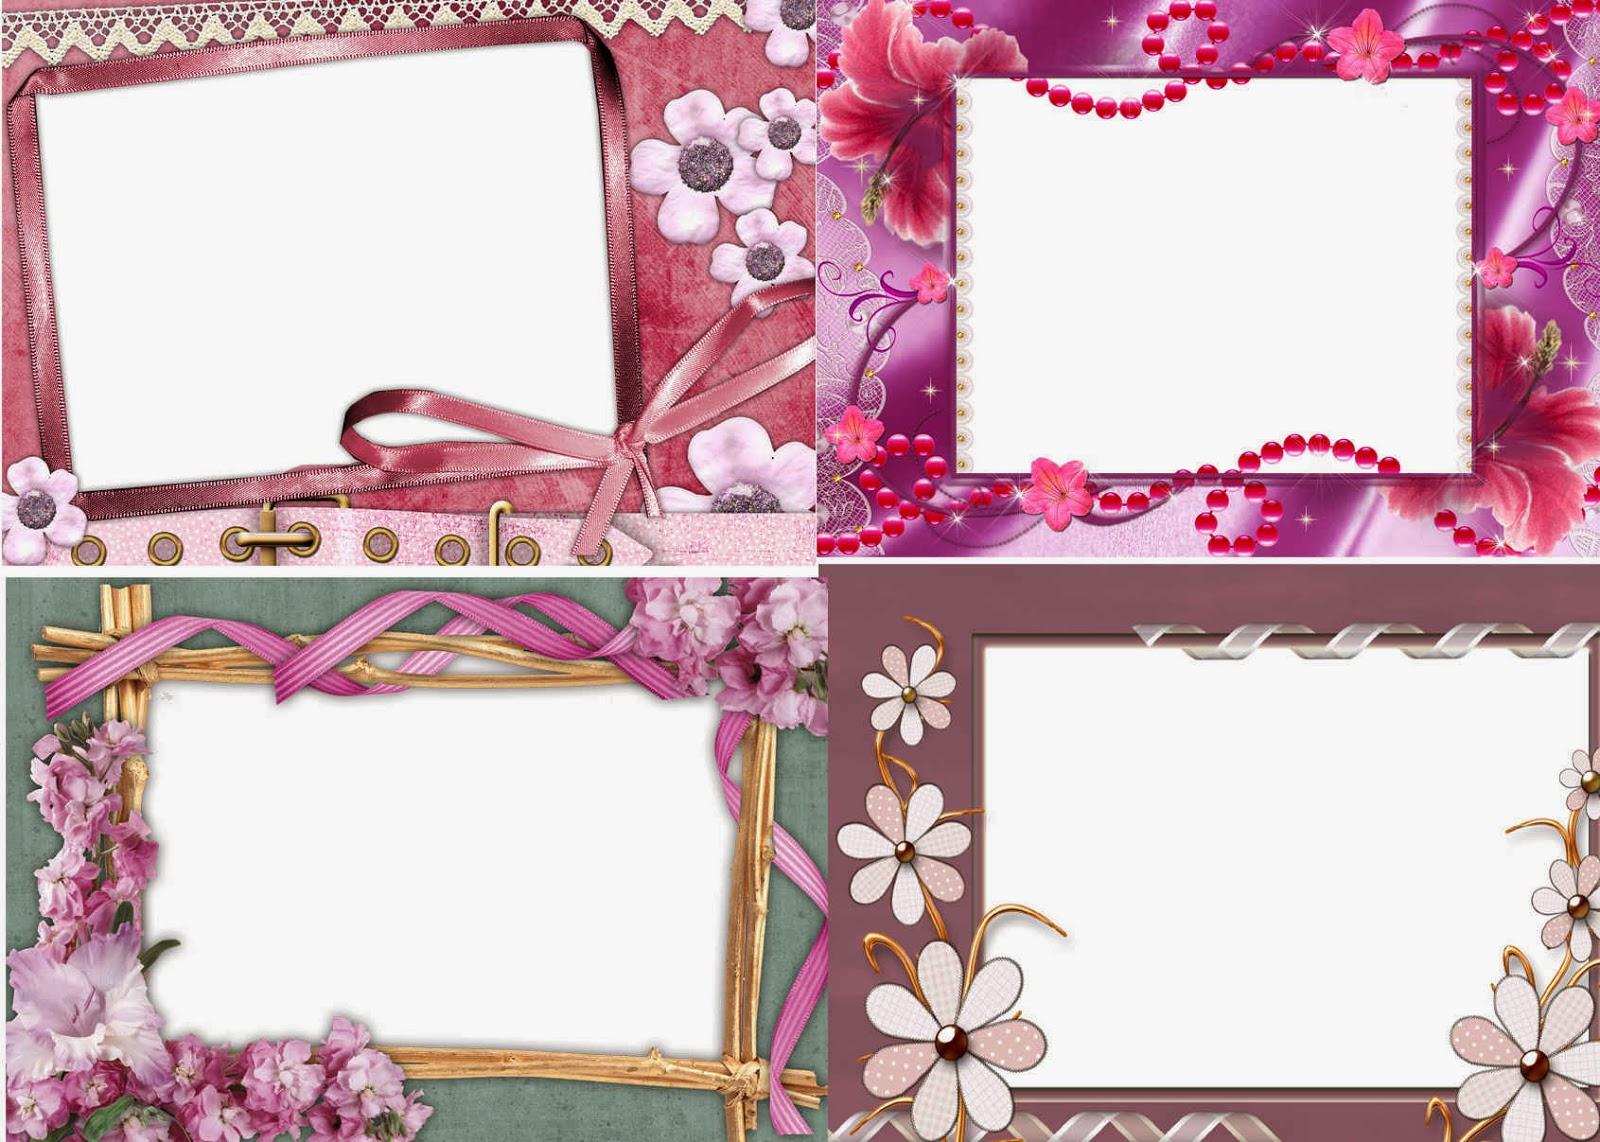 Design Home Game Online Photo Frame Png 16